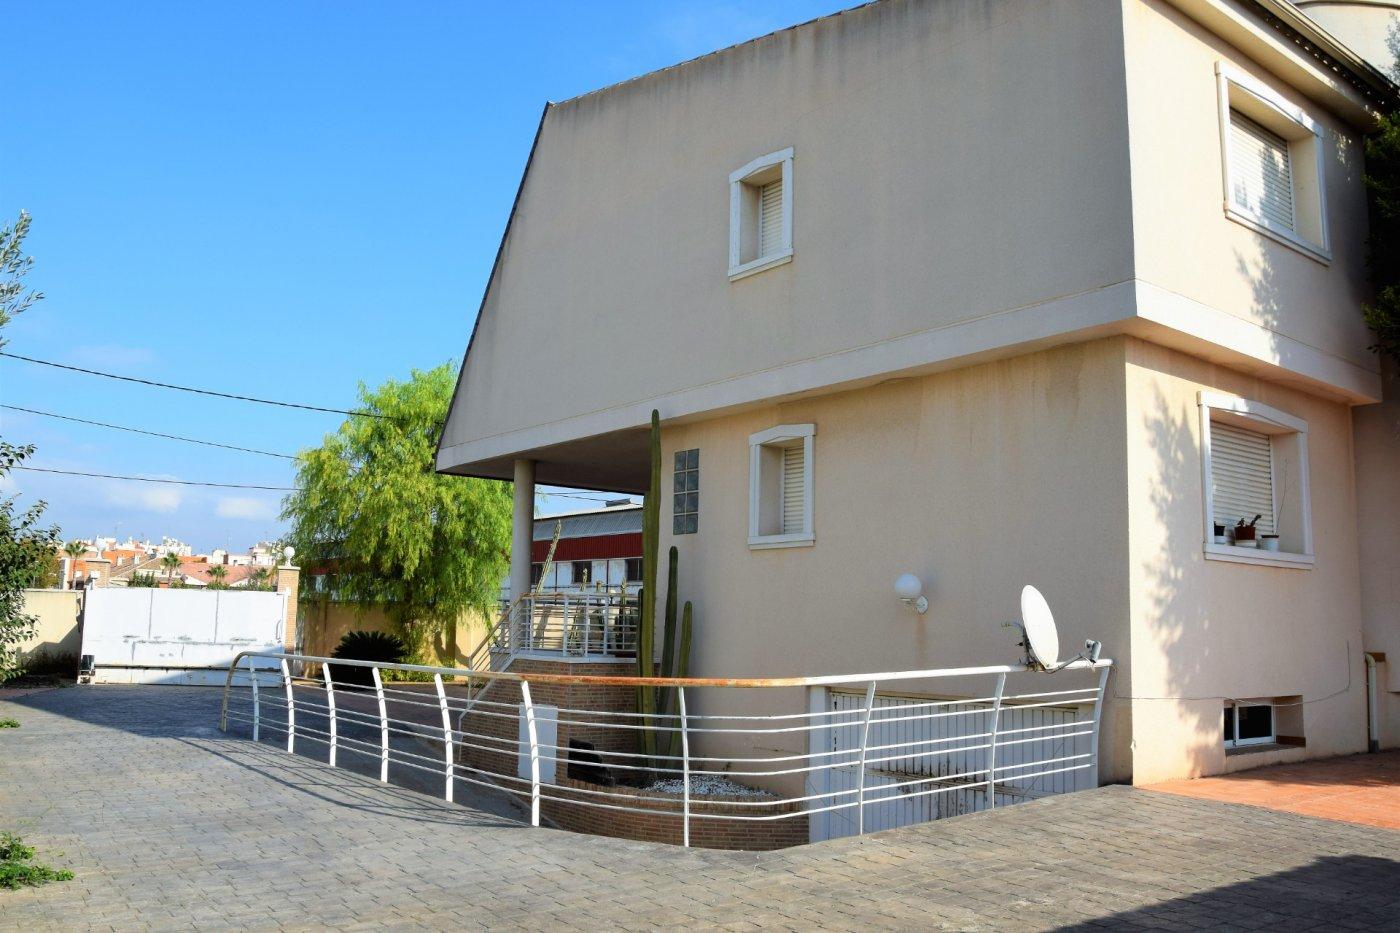 Chalet en Murcia www.joaquincarceles.com JC174 (44)